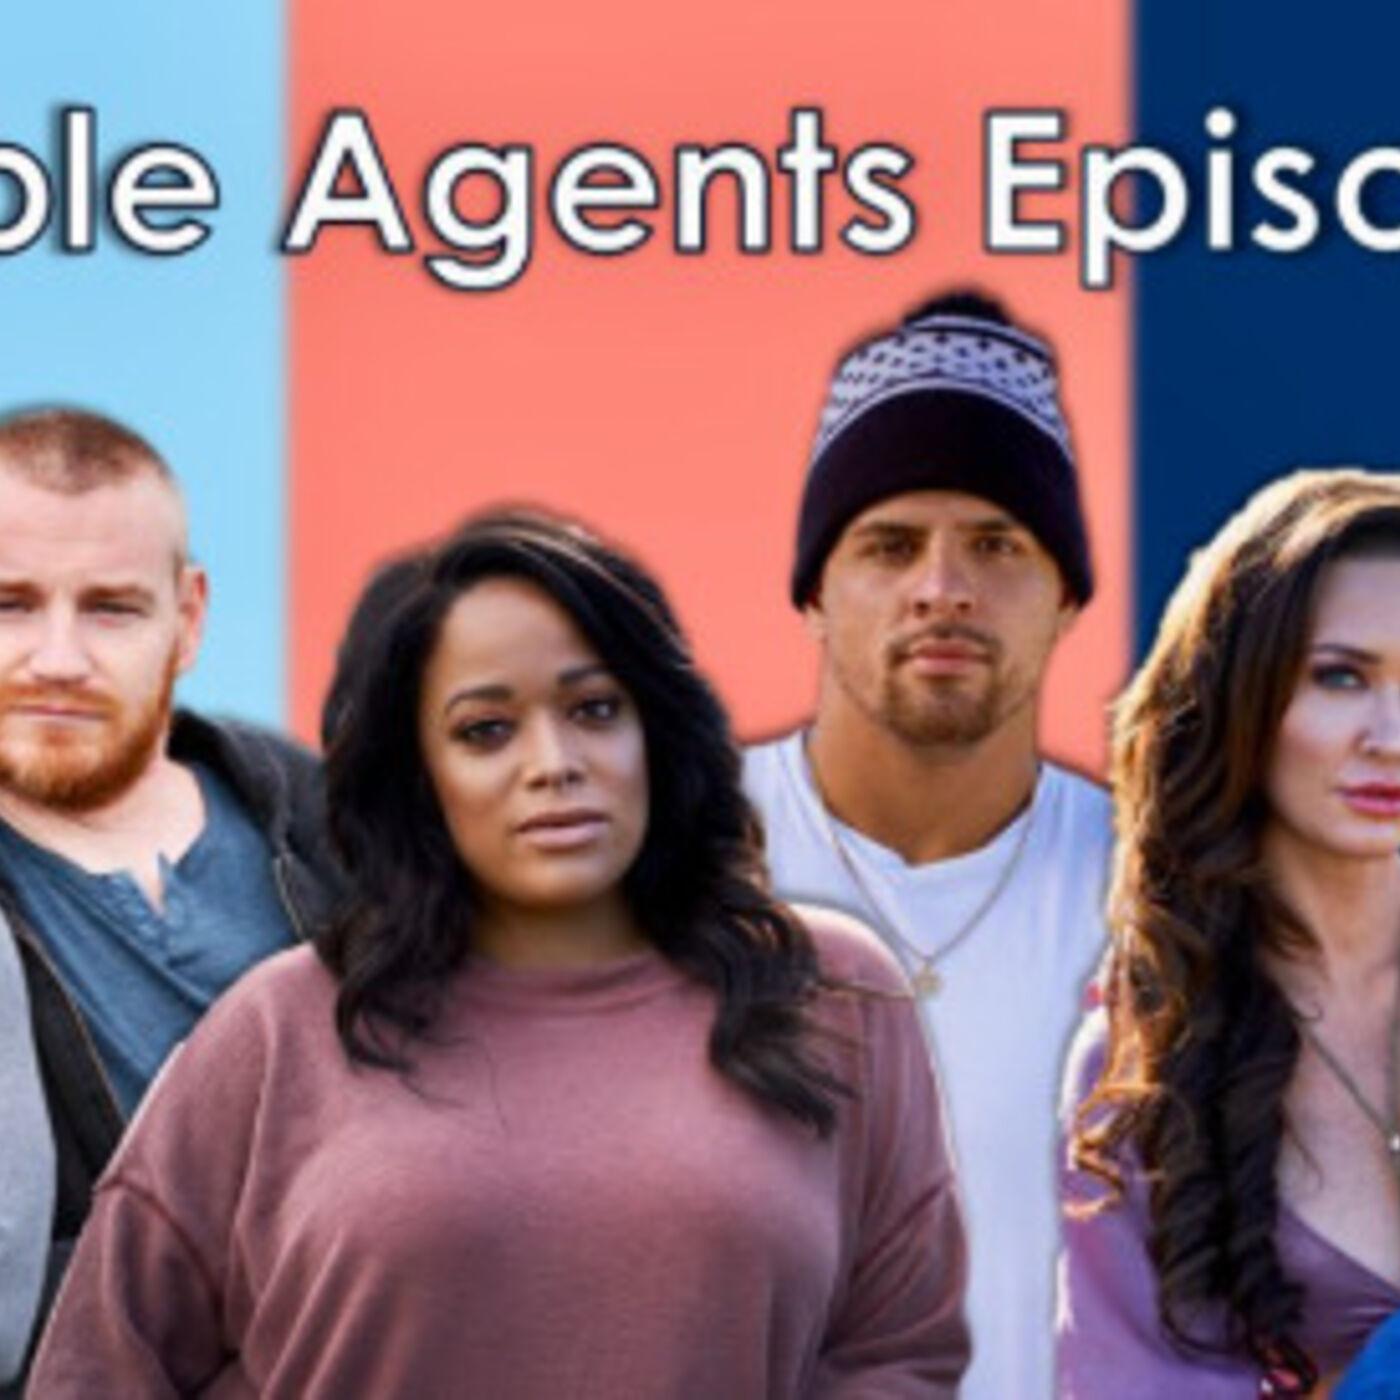 Challenge Double Agents Episode 2 Recap: Killa T and the Assassination of Jacob Allen